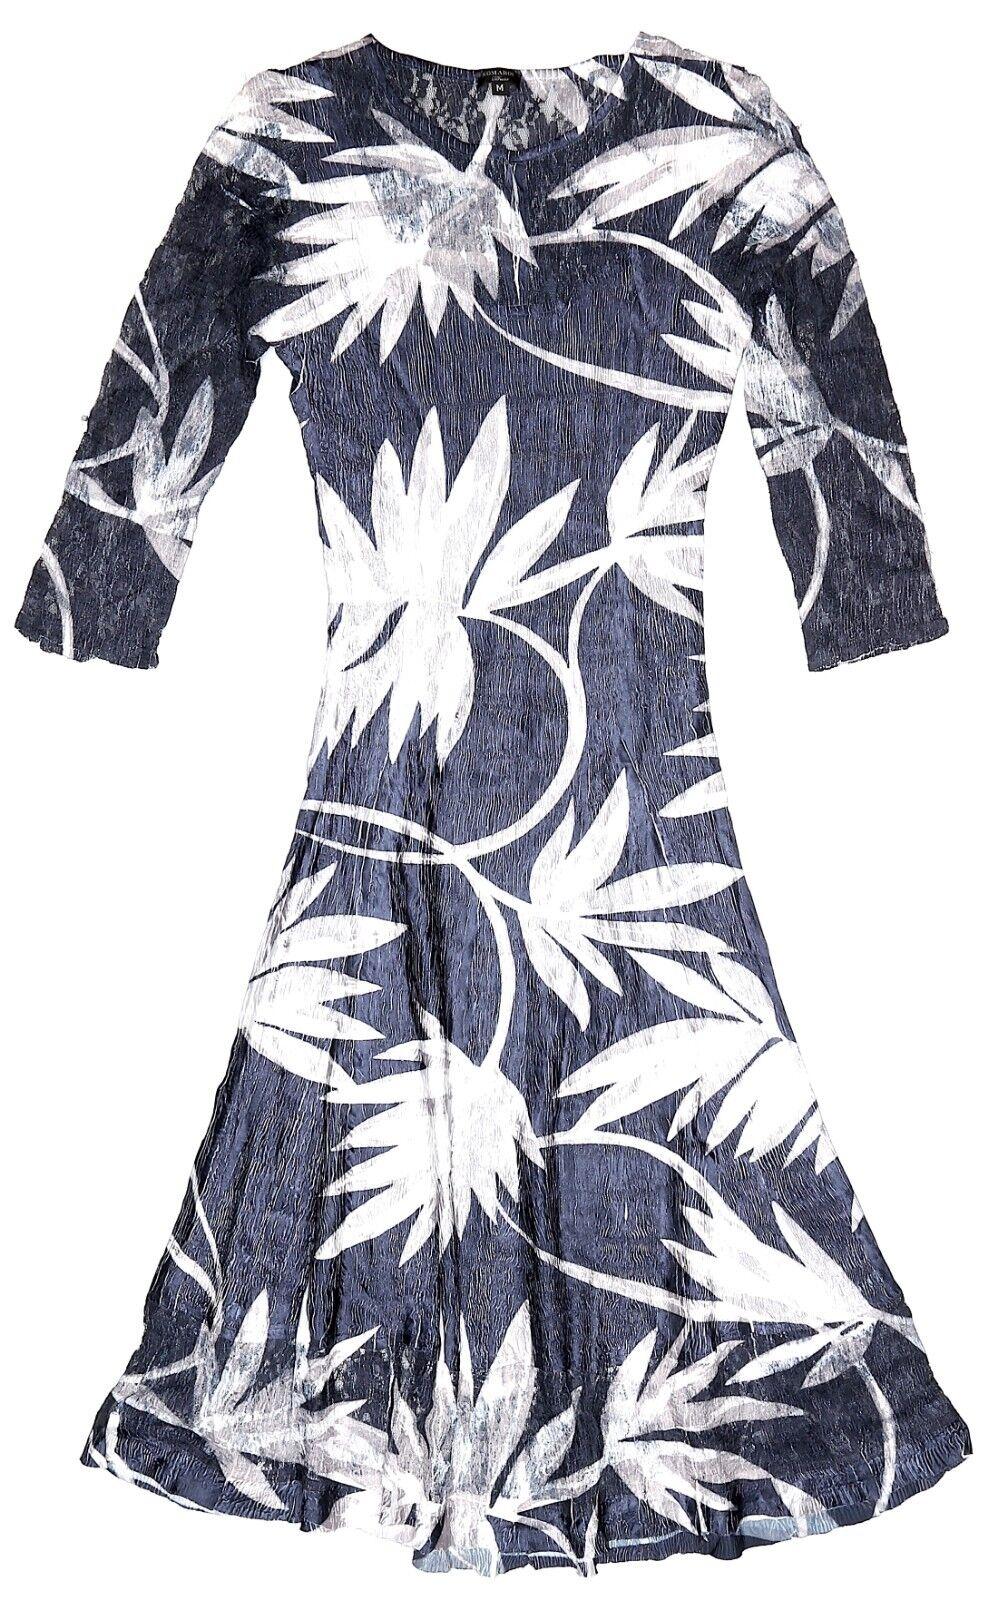 Komarov Womens Multi color Charmeuse Lace A Line Dress Sz M 3454